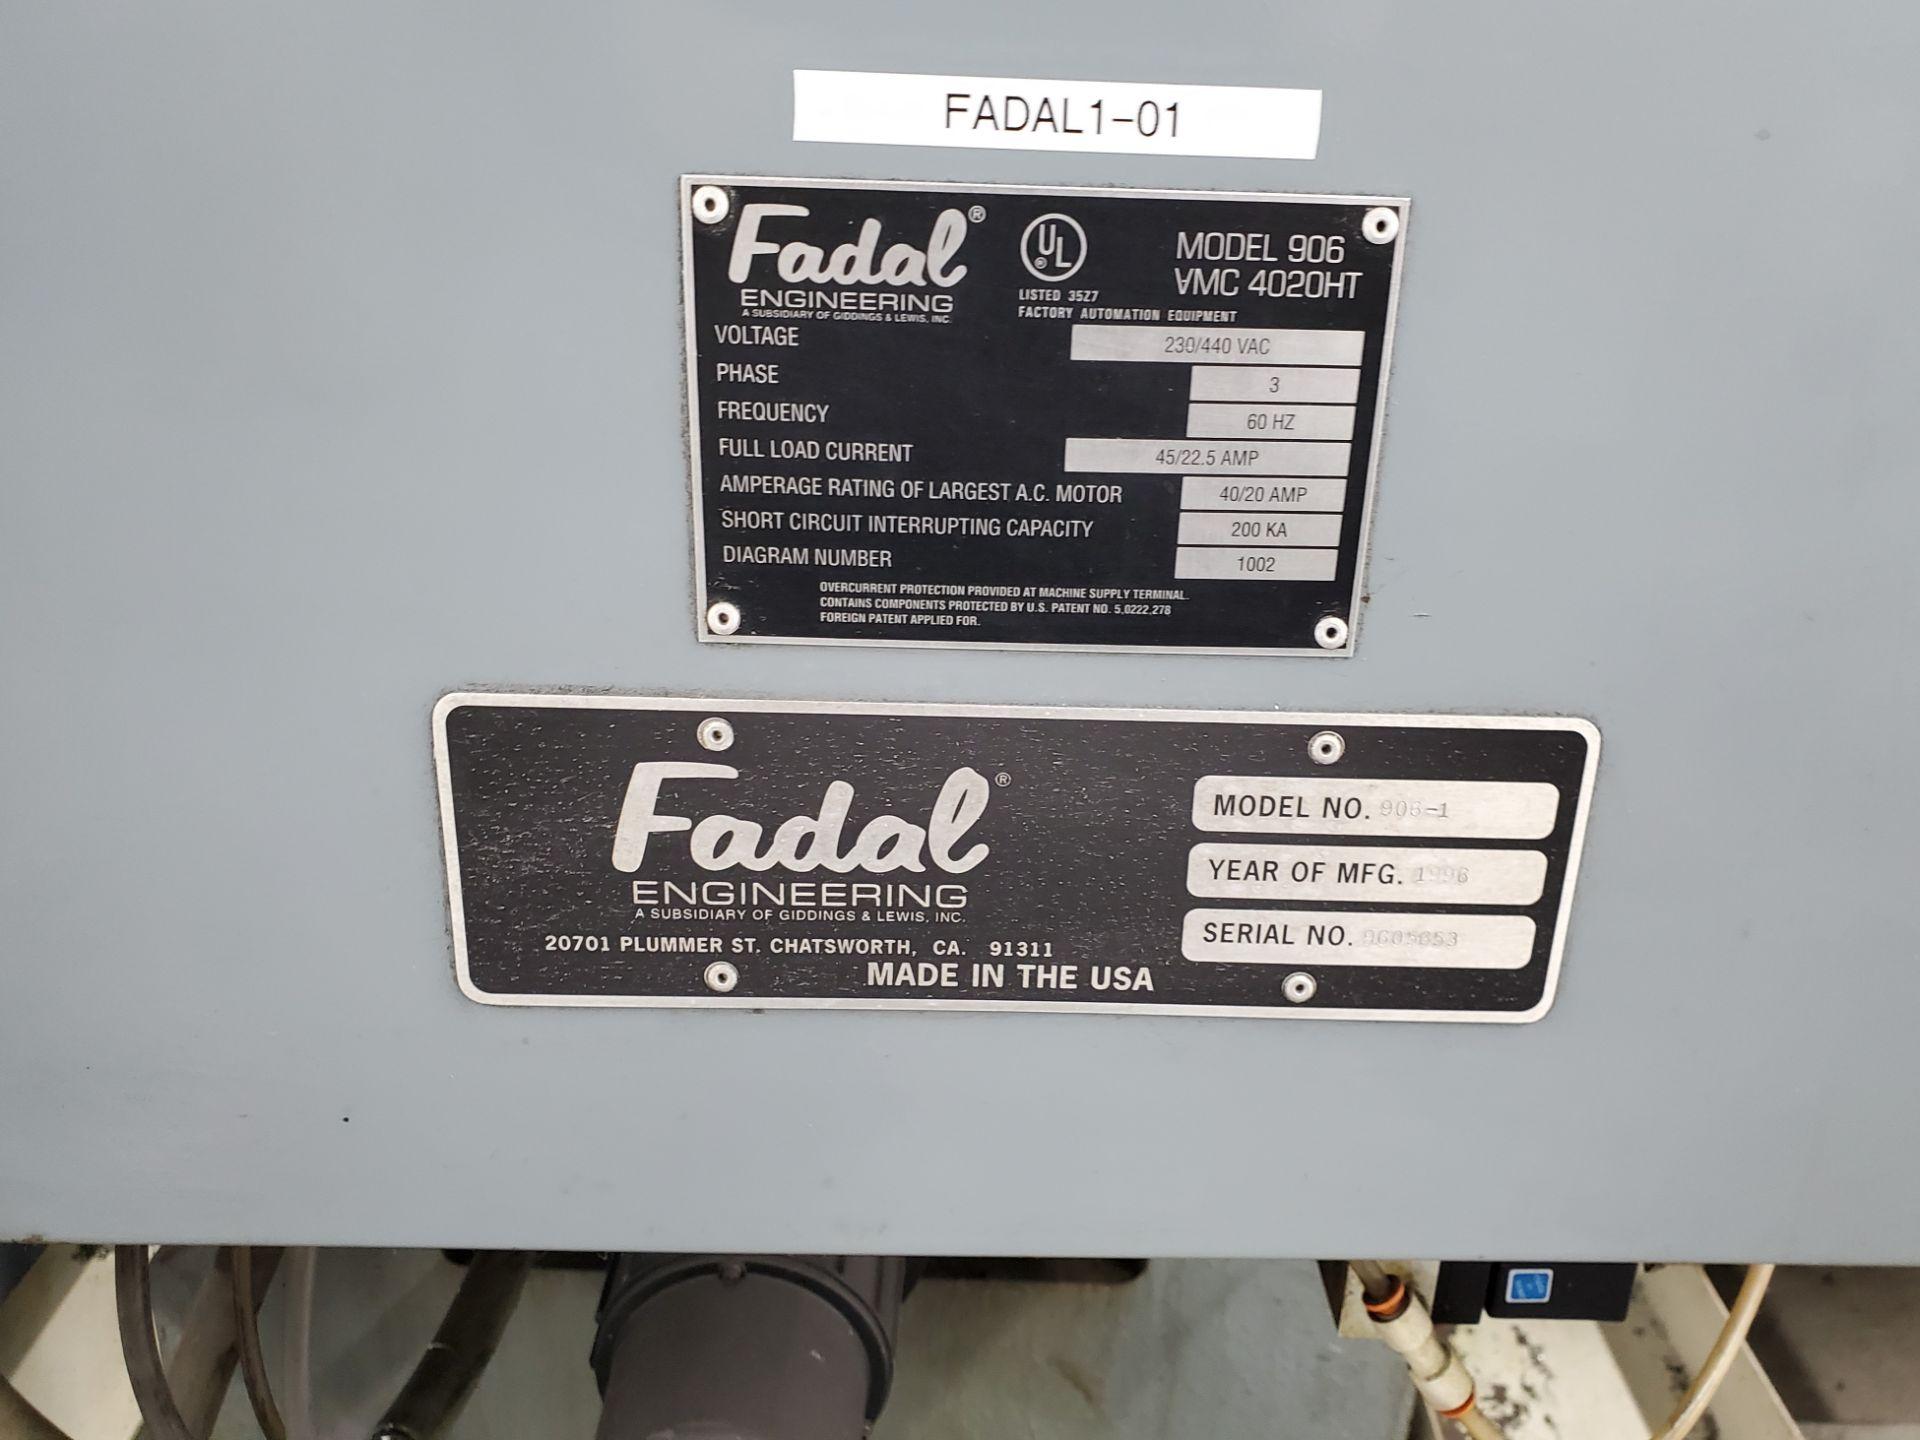 Fadal CNC Vertical Machining Center Model 4020 - Image 2 of 18